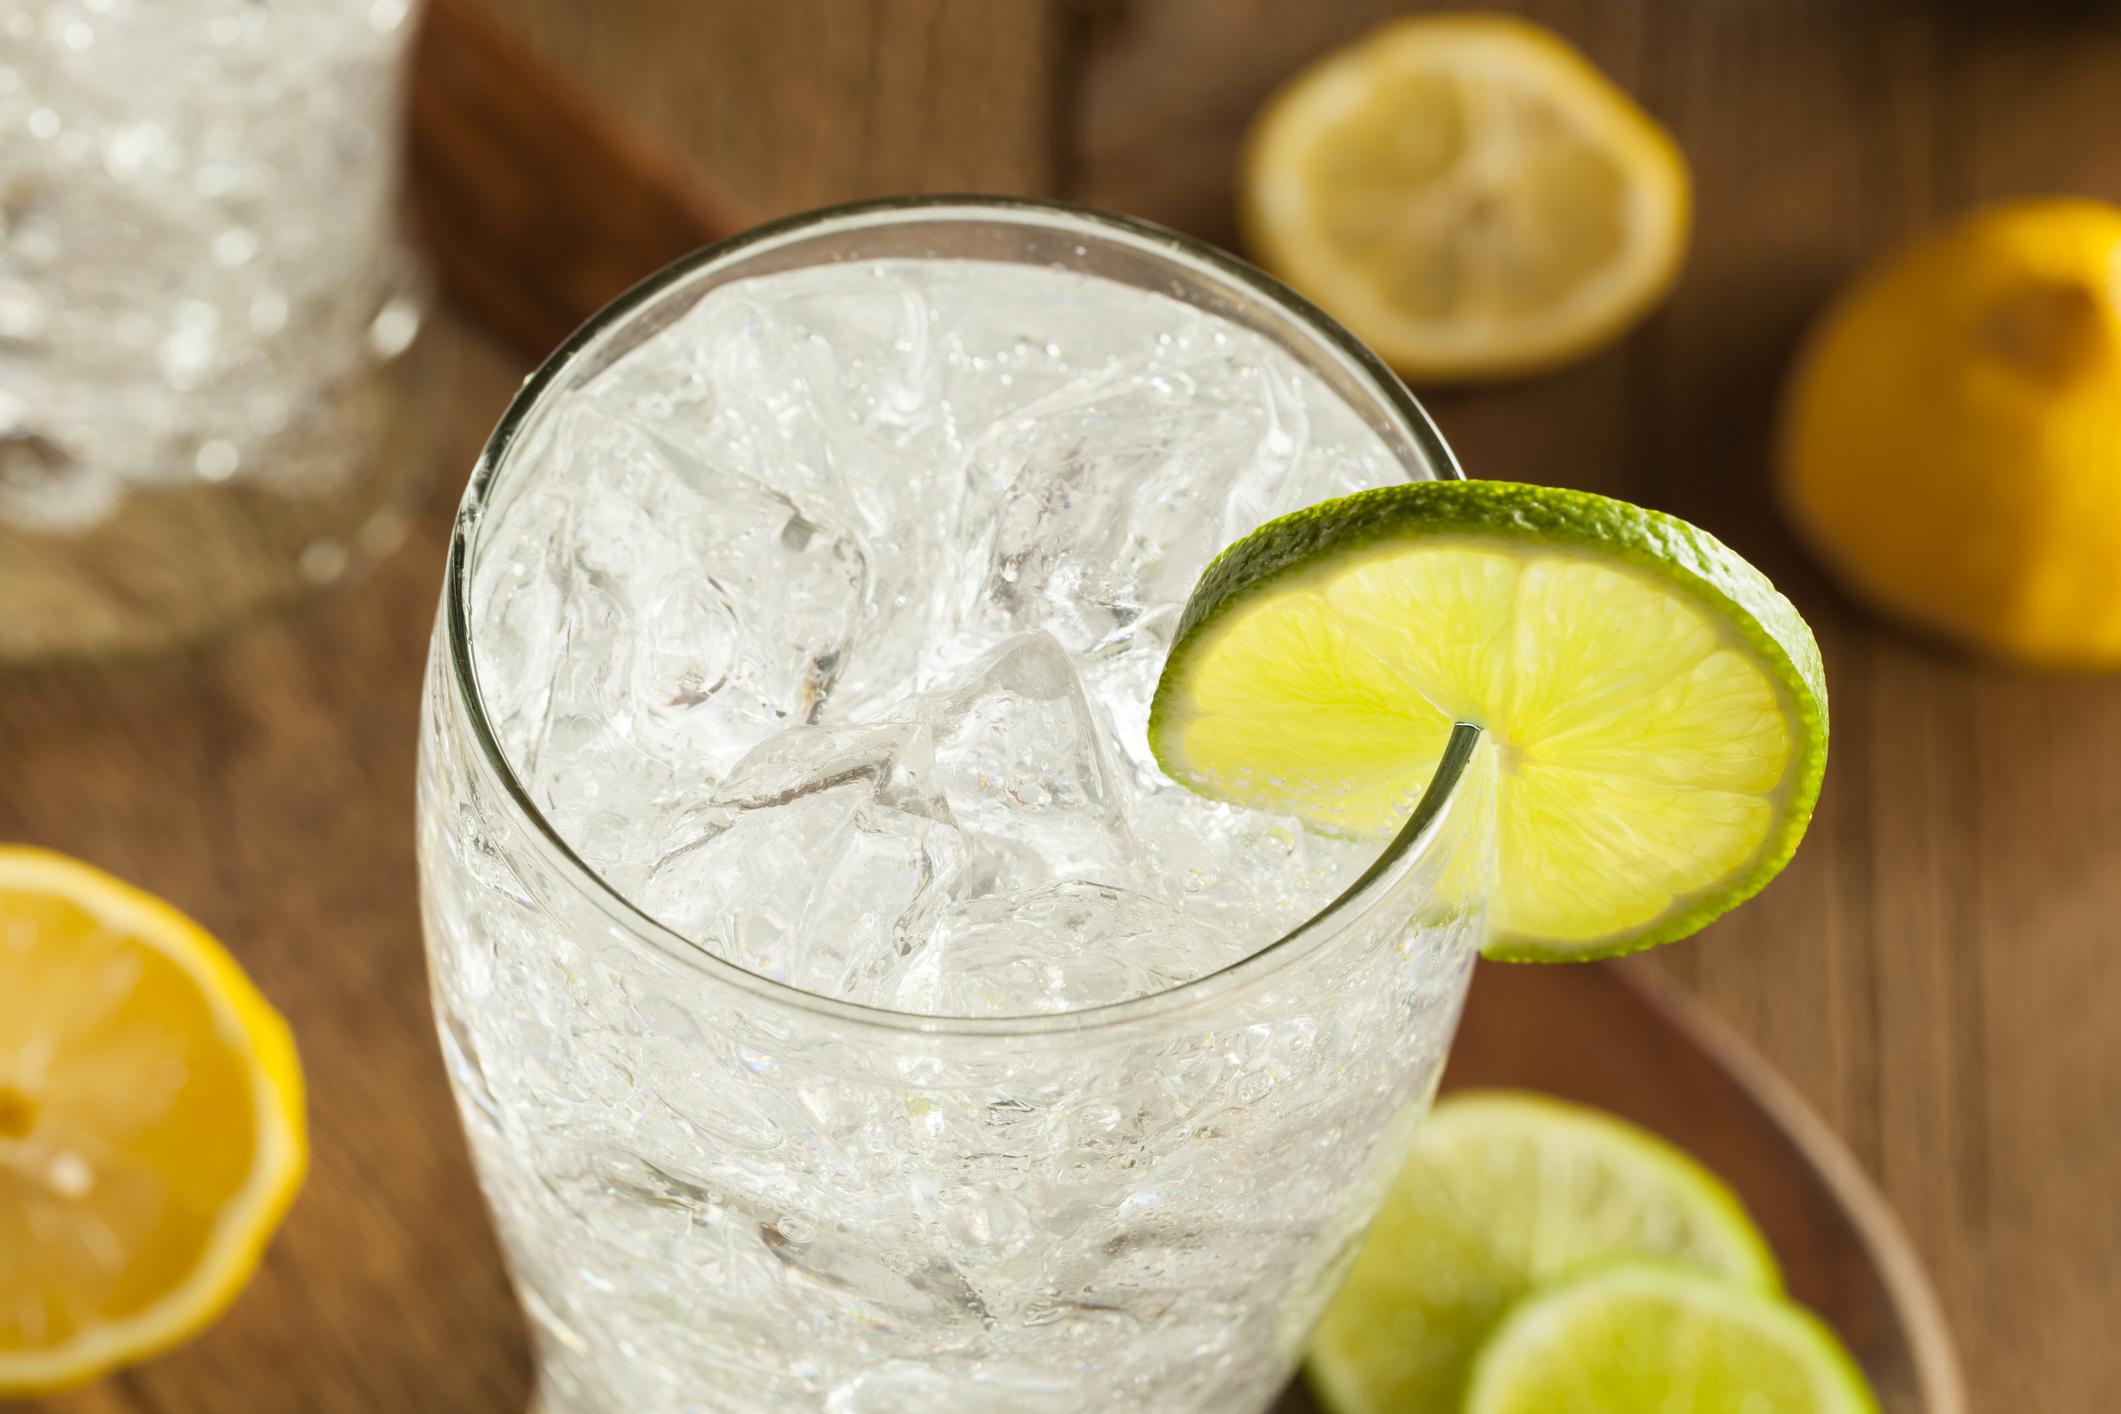 Sparkling soda in a glass